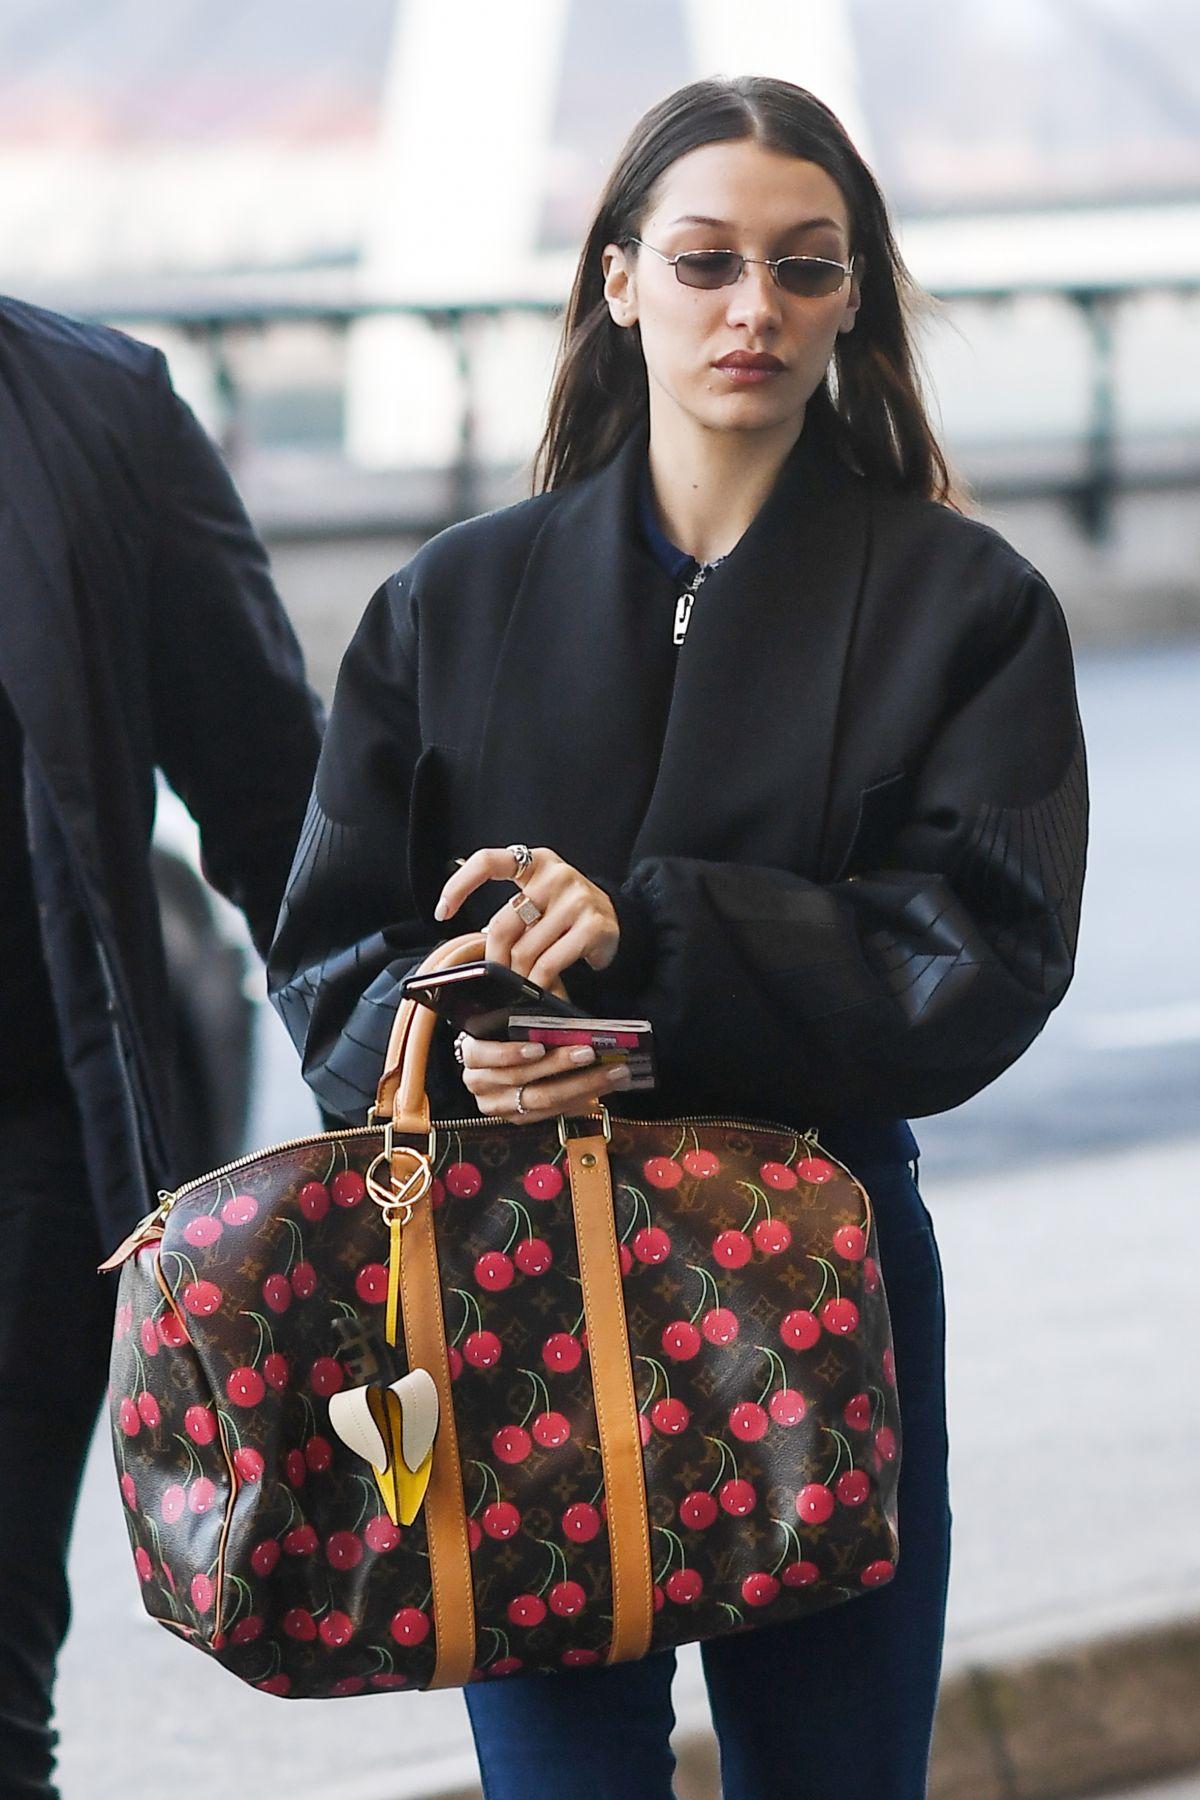 Bikini Chanel Iman nude photos 2019